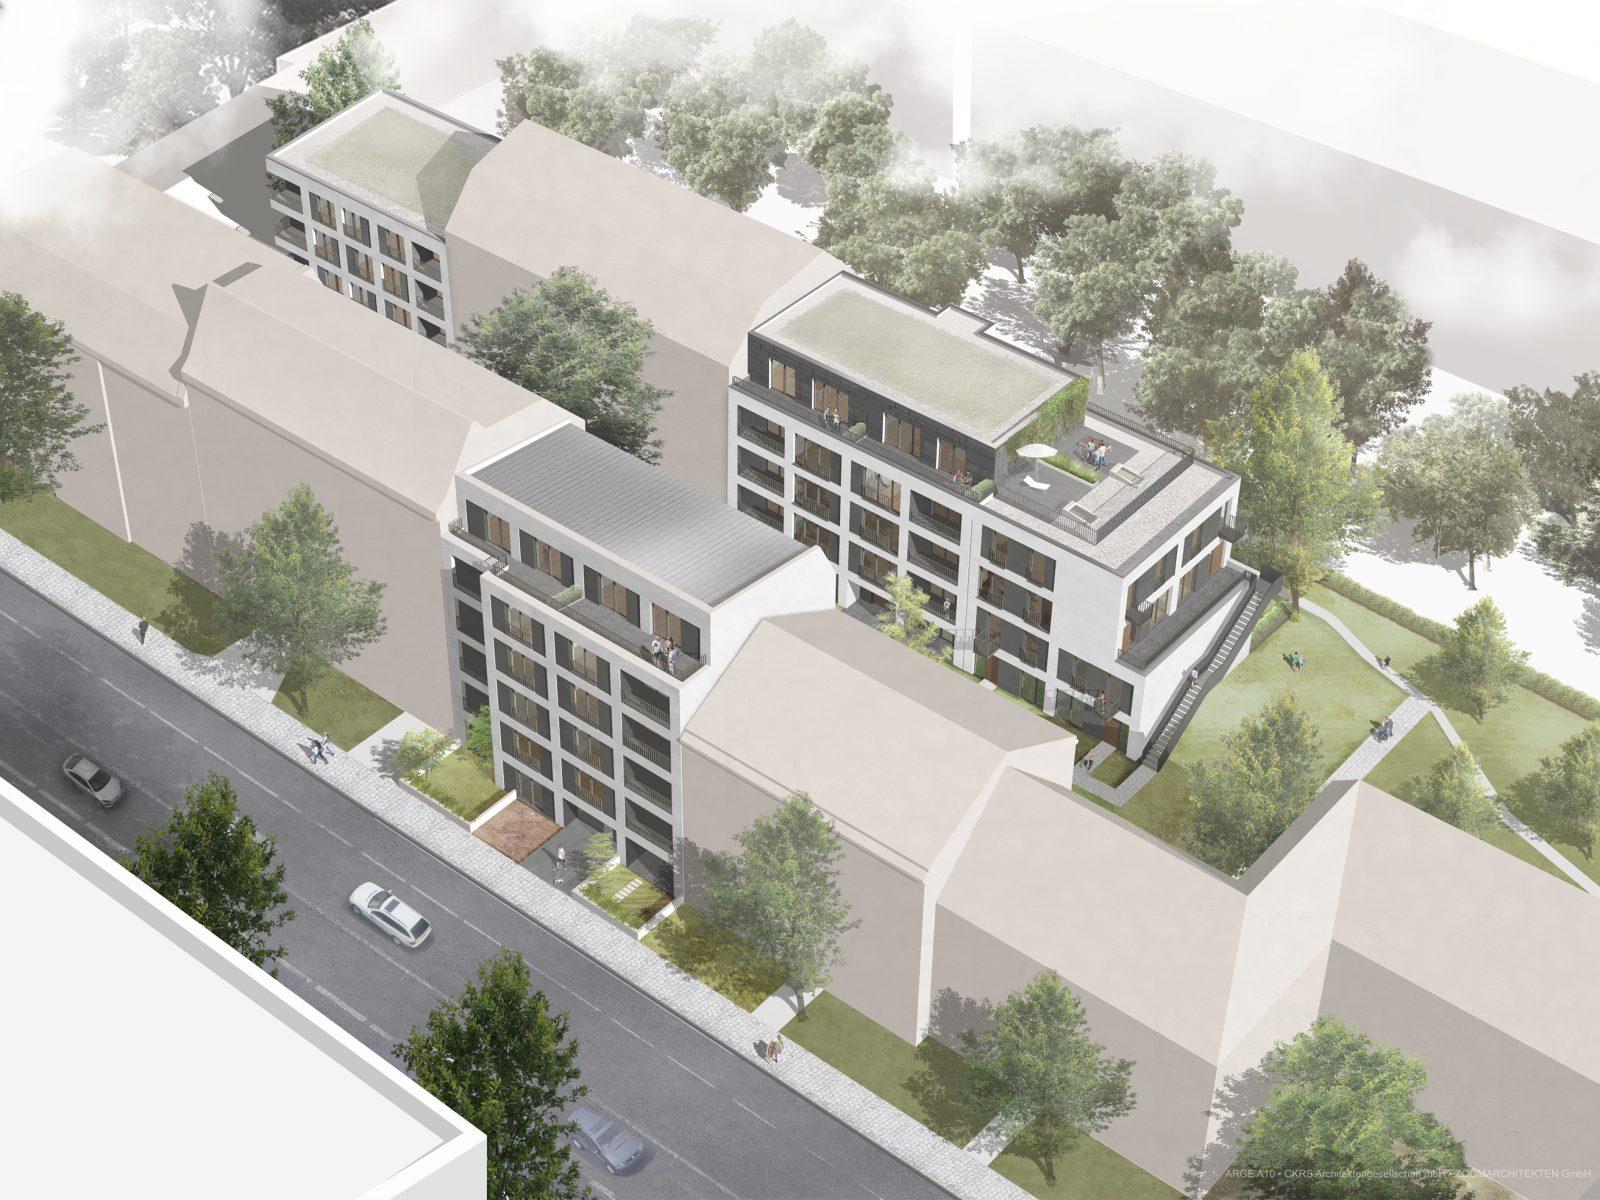 Drei Wohnhäuser in Adlershof